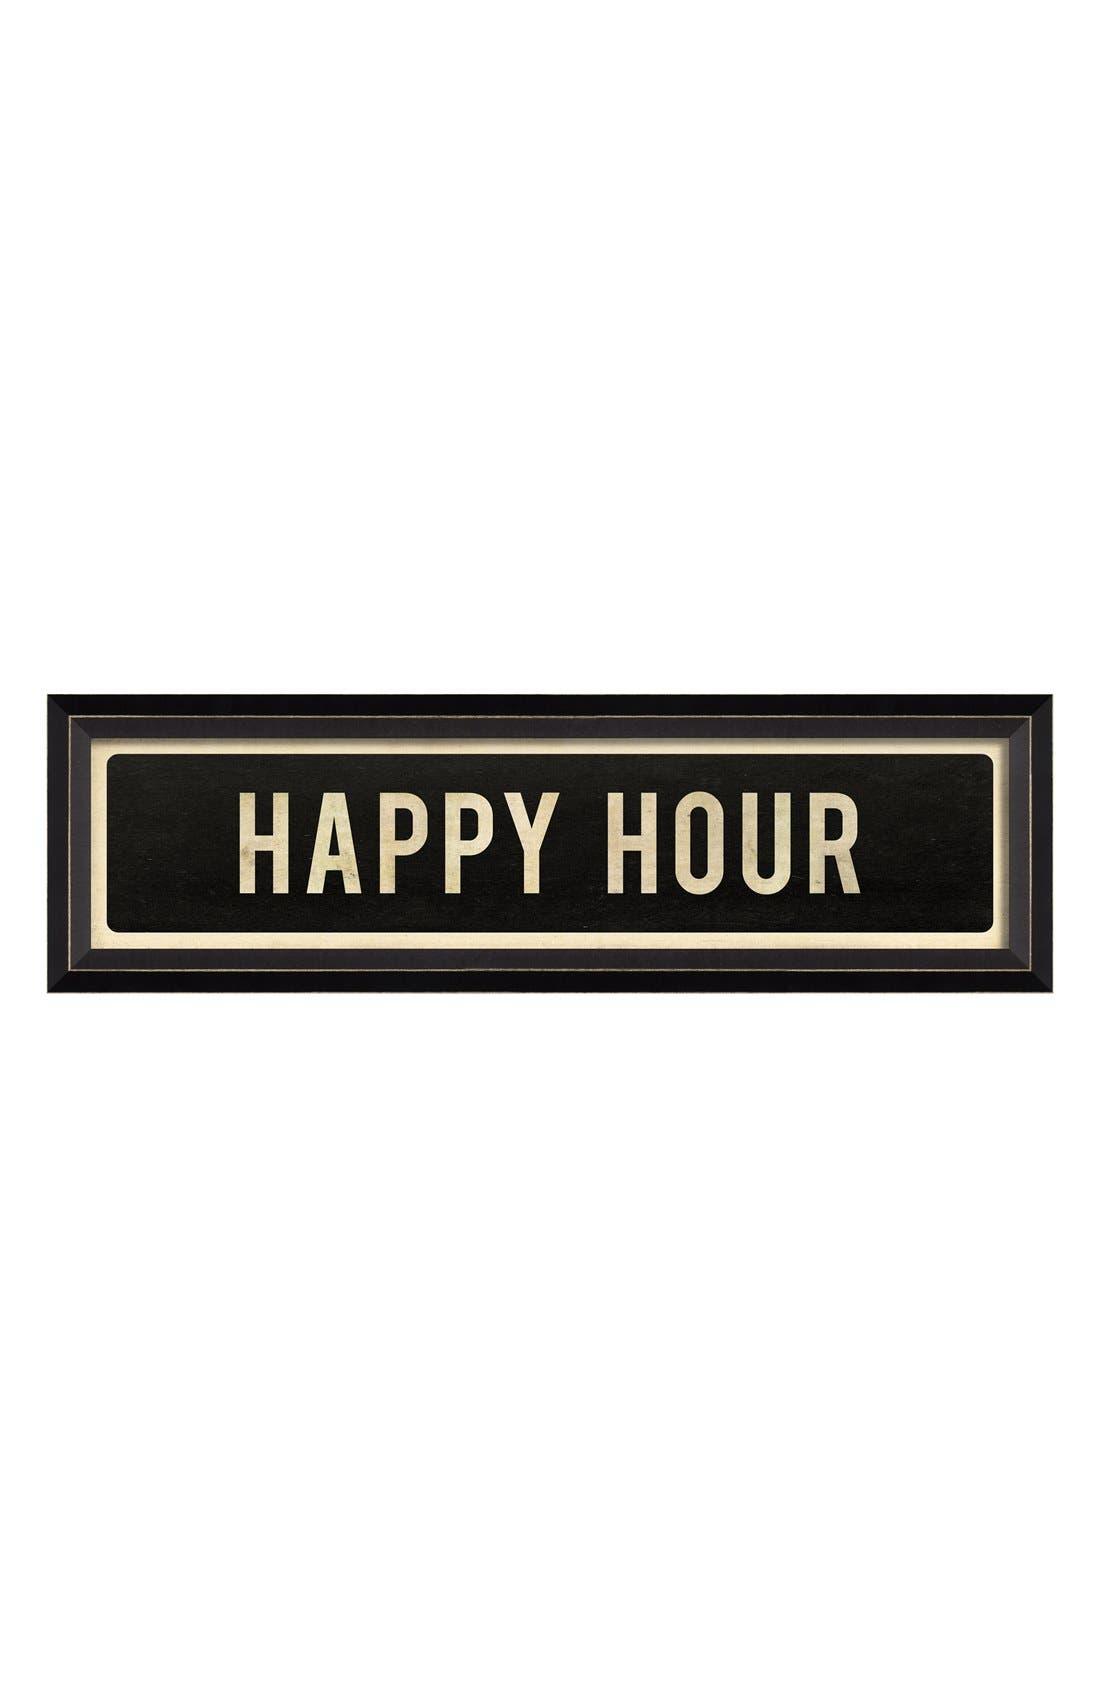 'Happy Hour' Vintage Look Street Sign Artwork,                         Main,                         color, 001